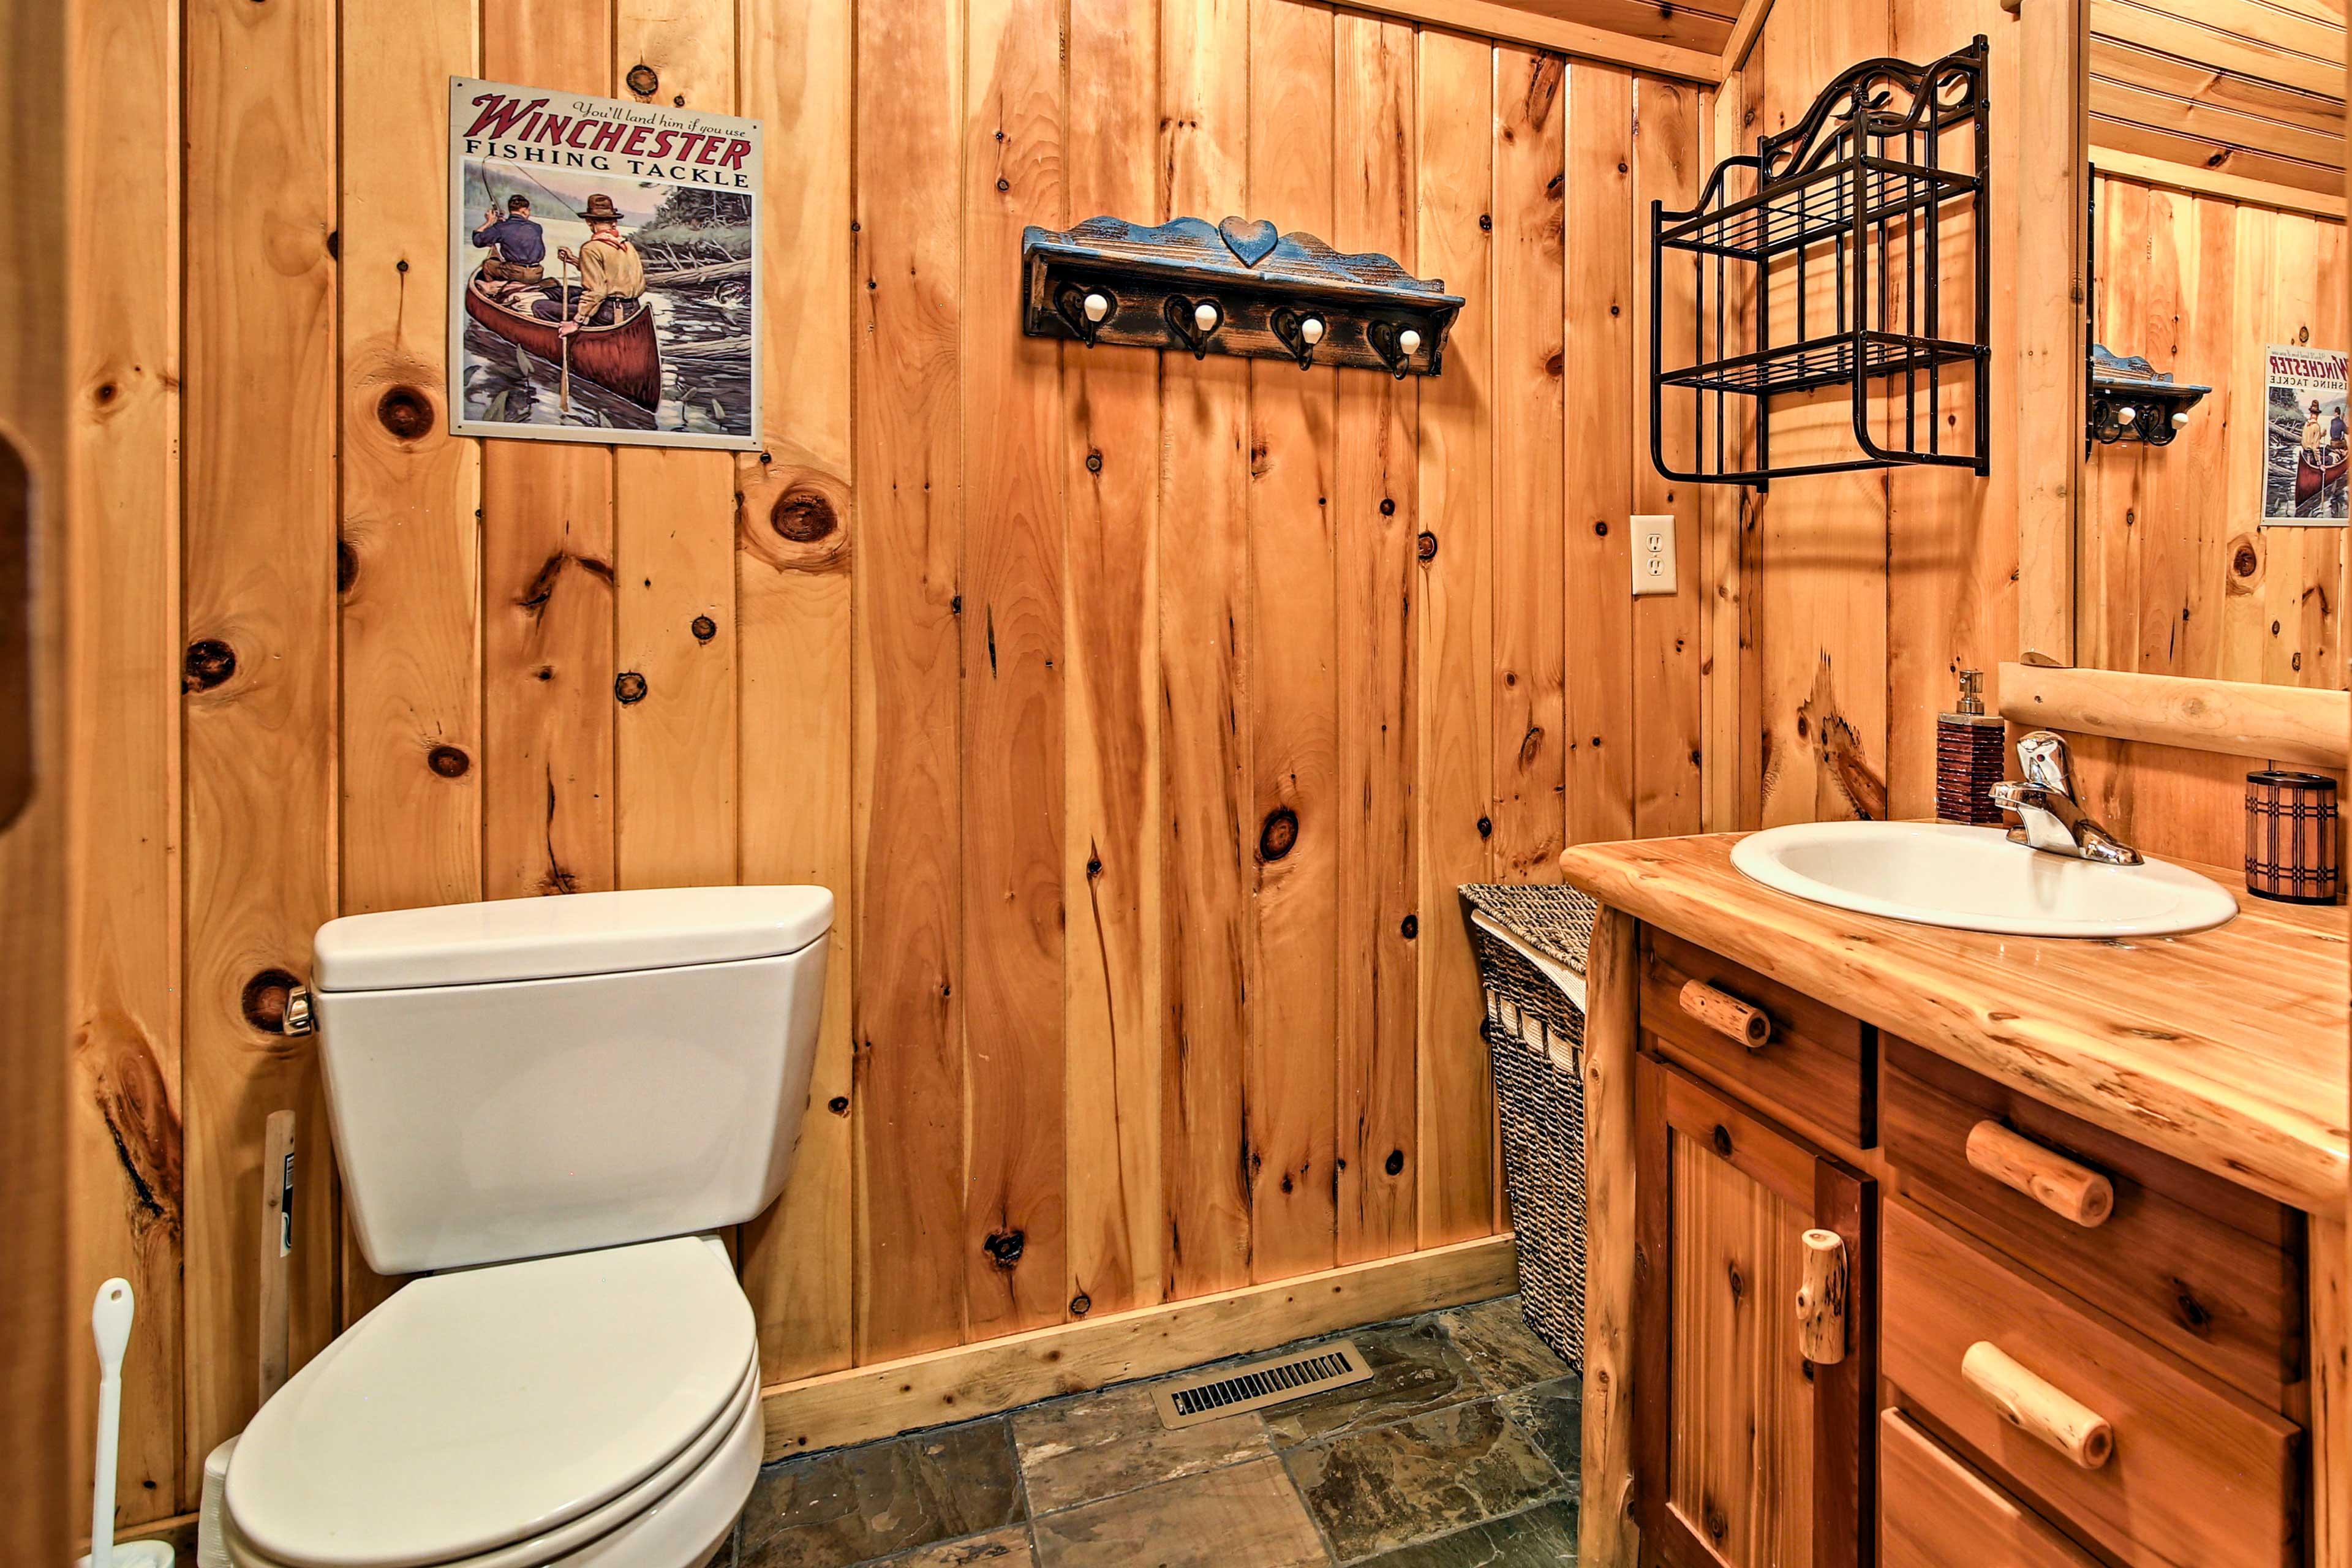 The second full bathroom.